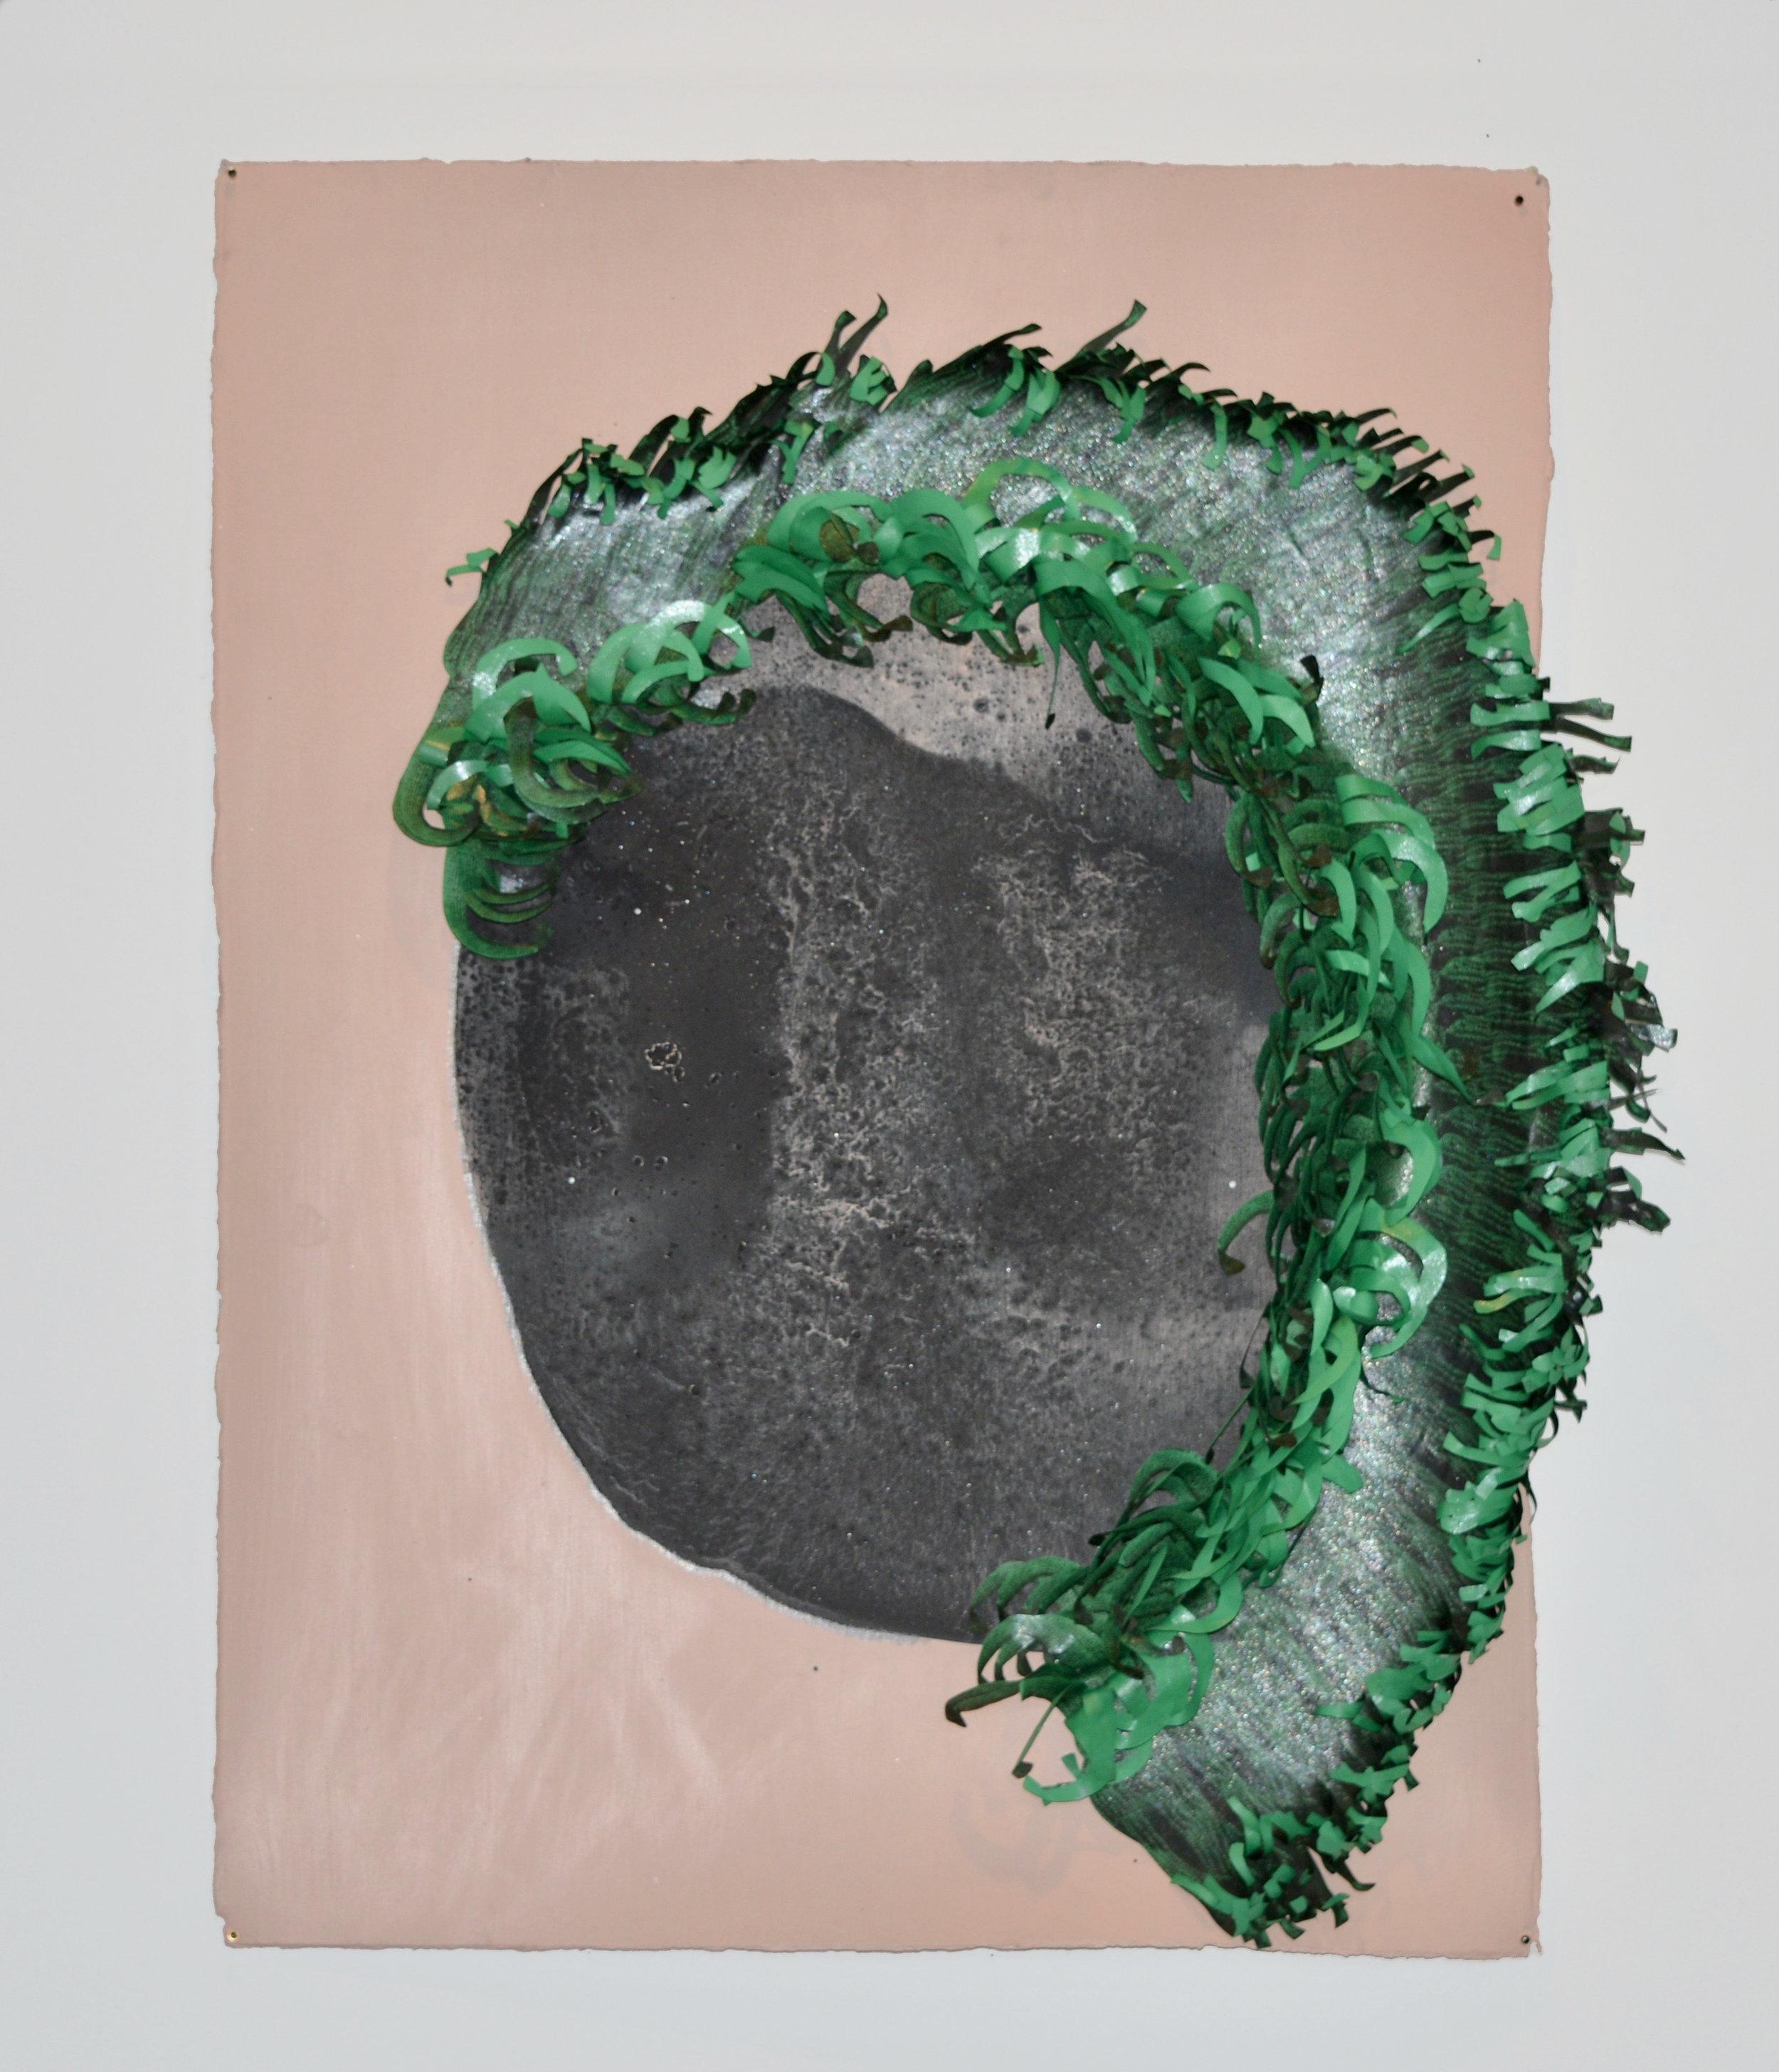 Yanique Norman   Quashie Silences: Jade Pinkgill Reverbs #1,  2019  Acrylic, gouache, matte medium, xerox, and collage on paper  30H x 22W inches